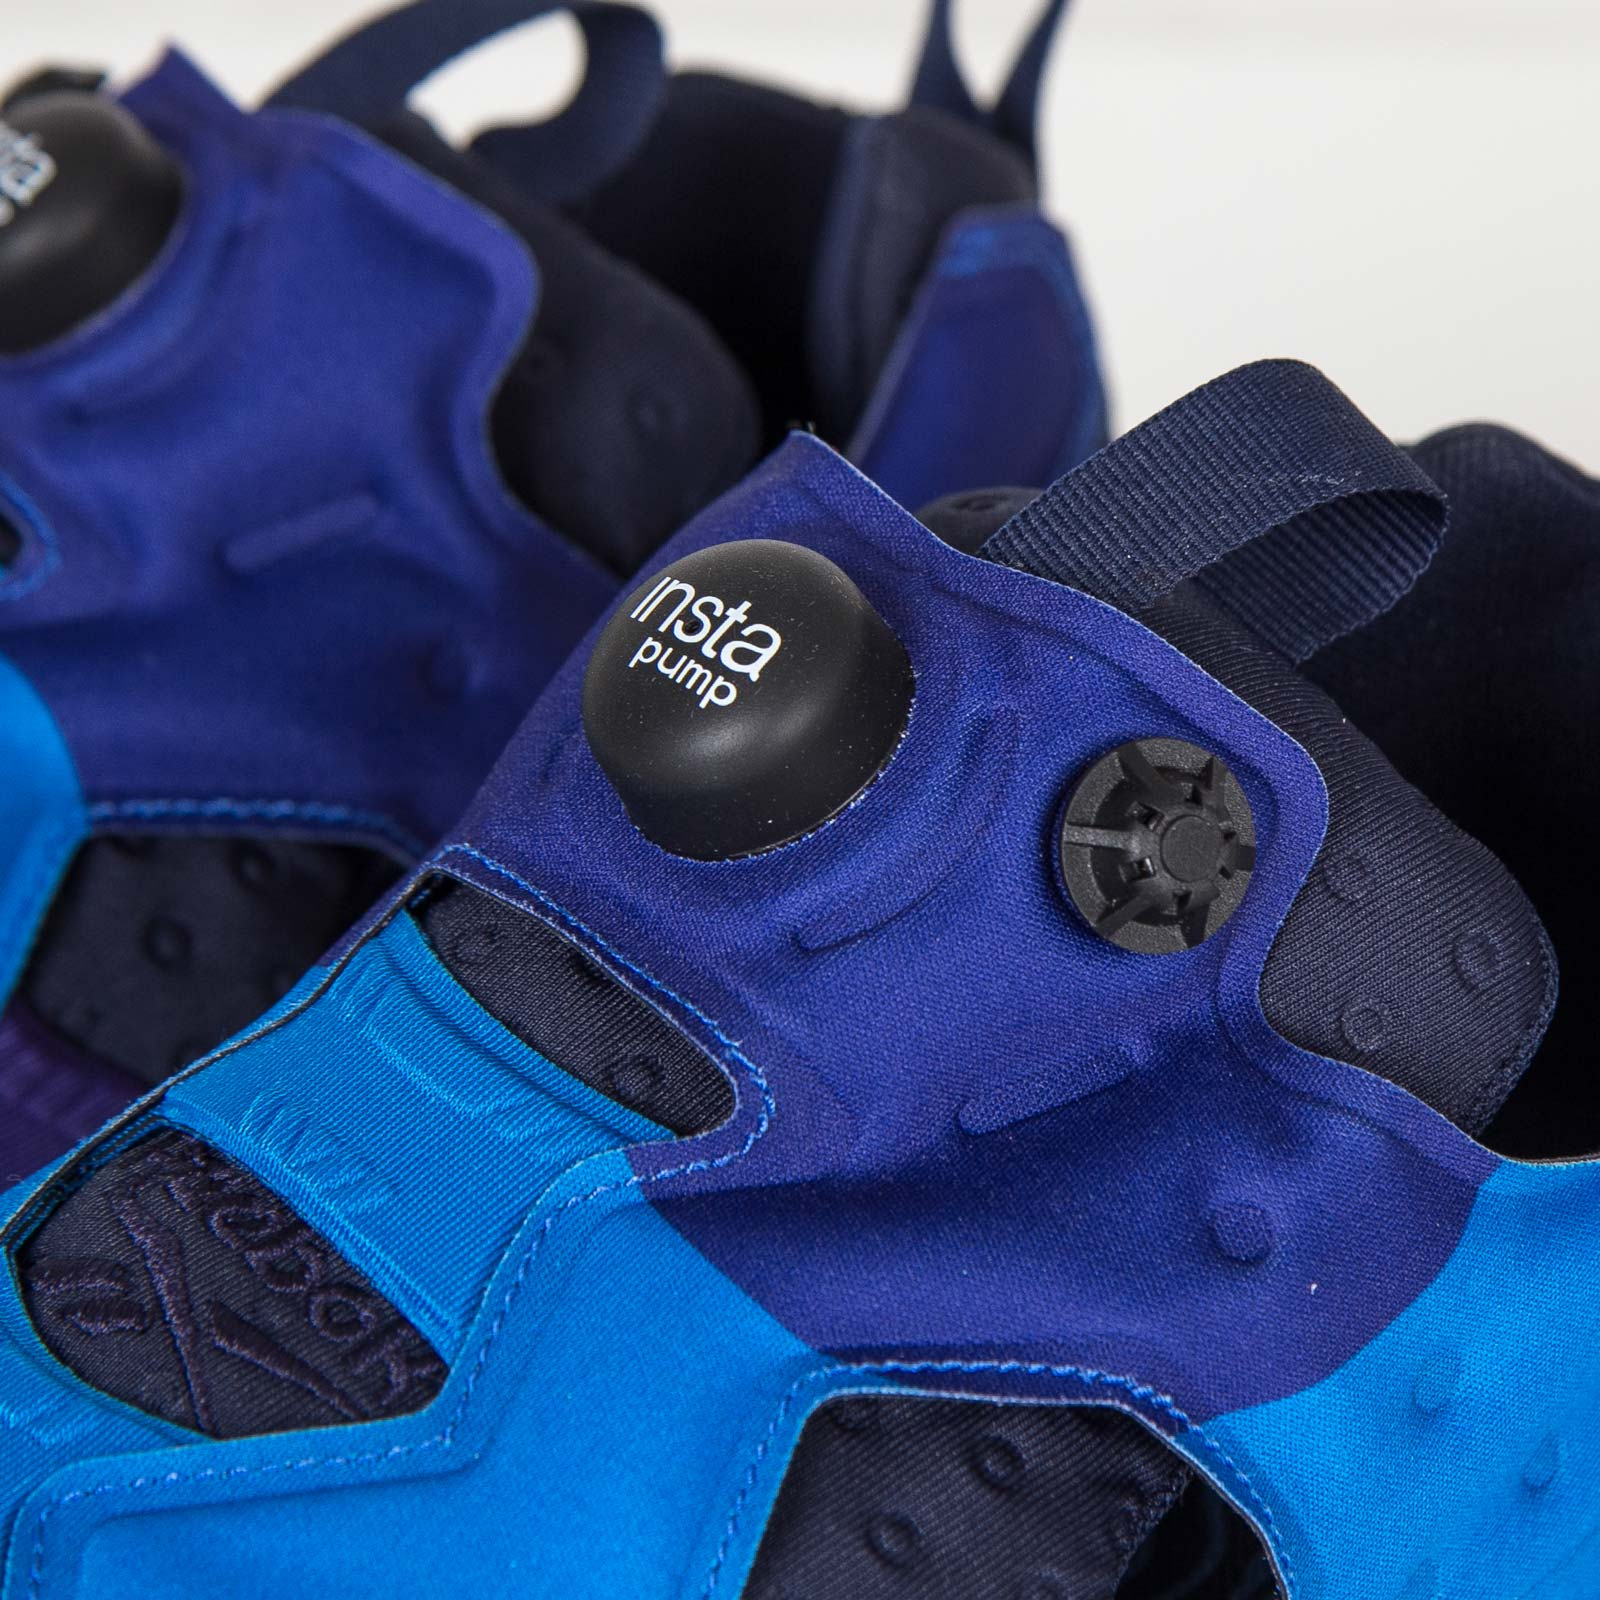 354644d5de0 Reebok Instapump Fury Asym - V67792 - Sneakersnstuff